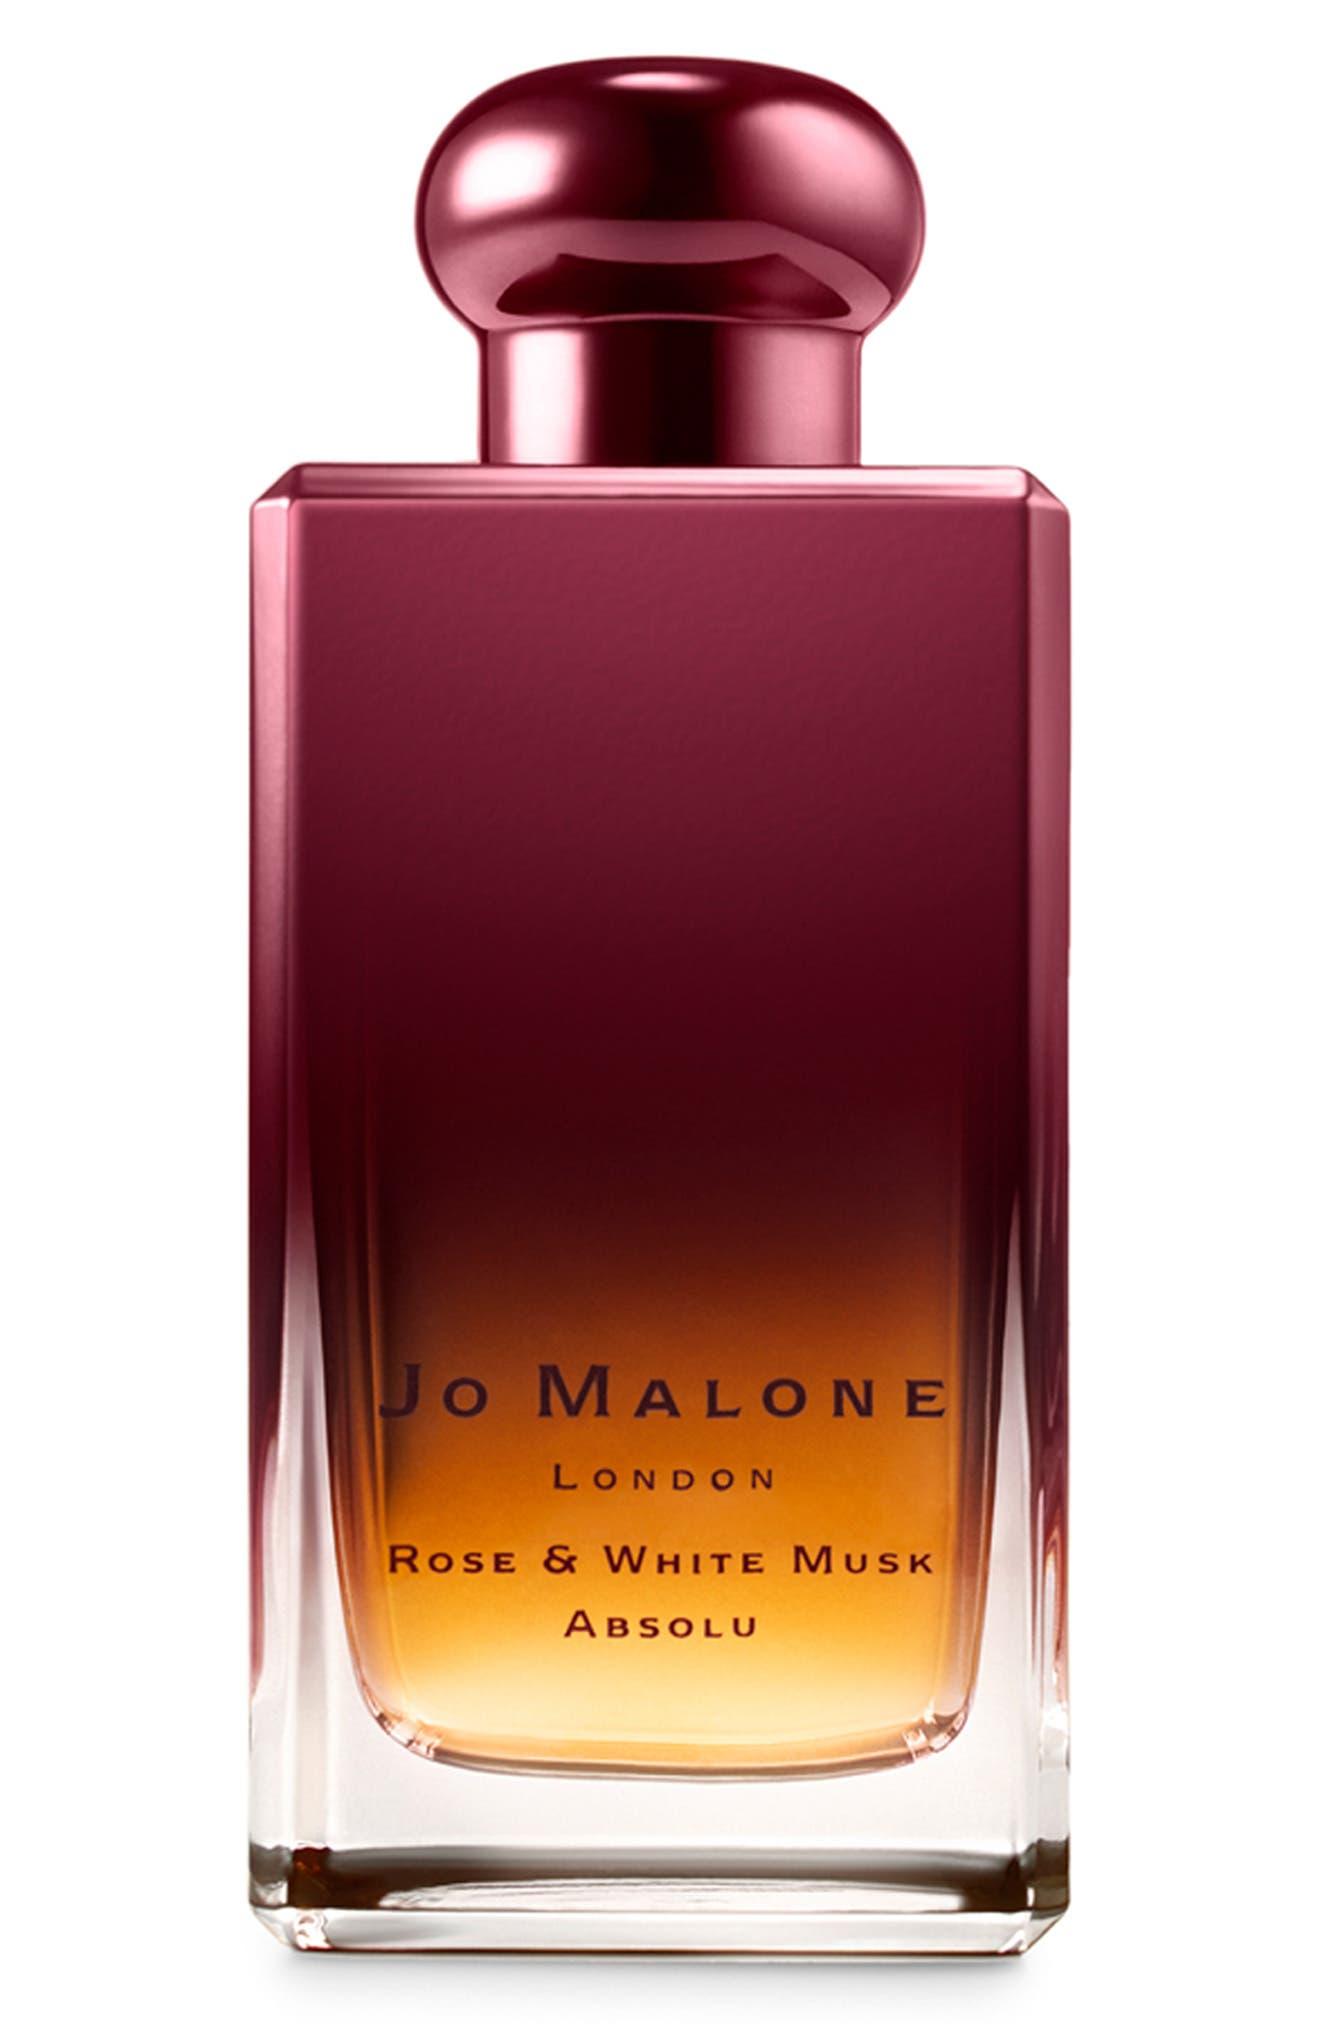 Jo Malone London(TM) Rose & White Musk Cologne Absolu